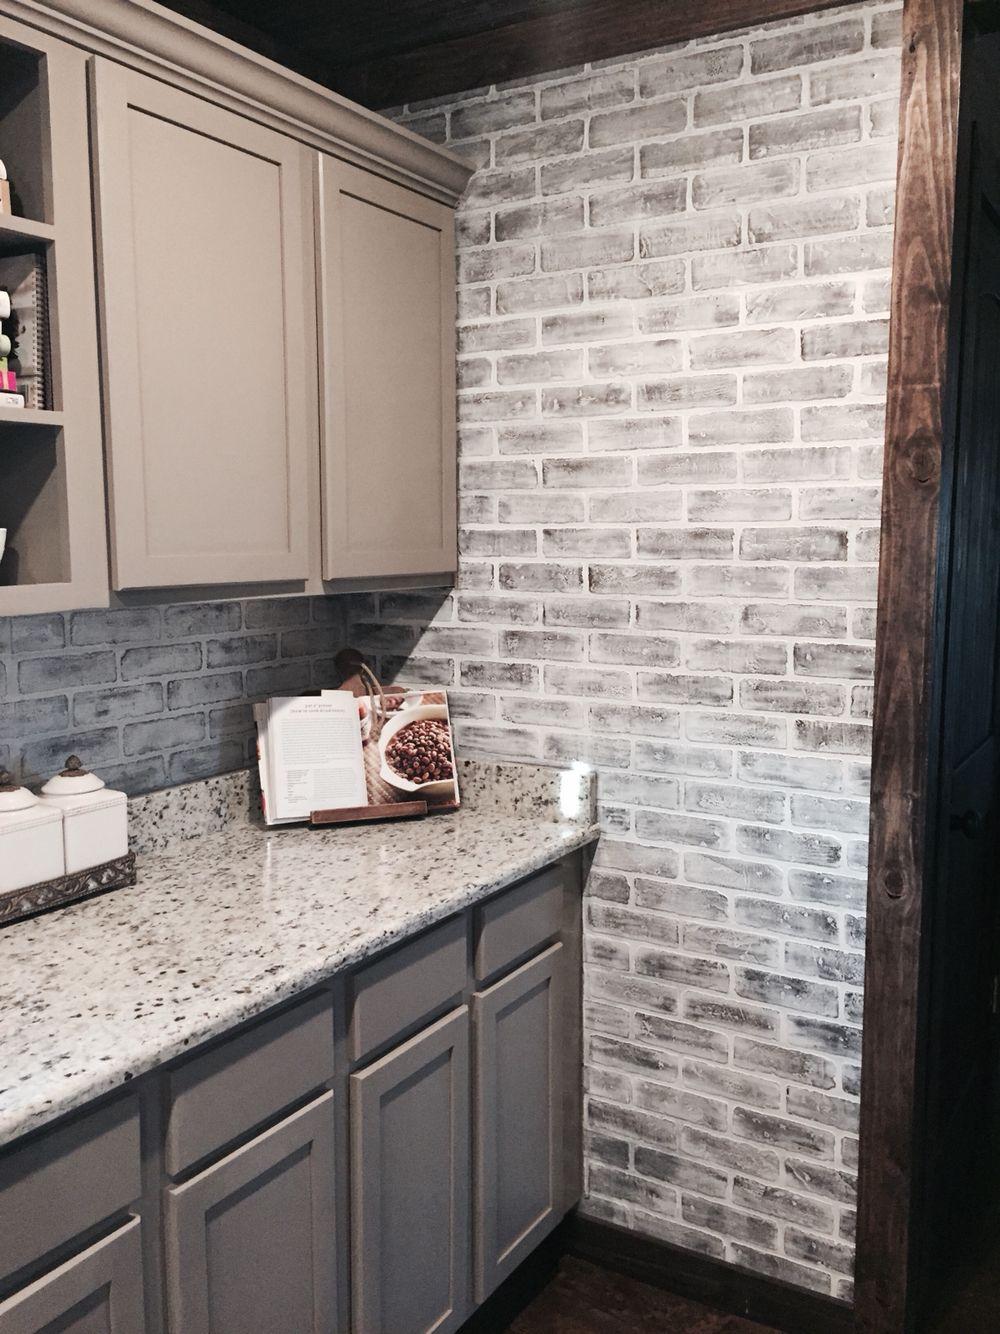 Lowes brick panels painted white. Brick backsplash. Paint